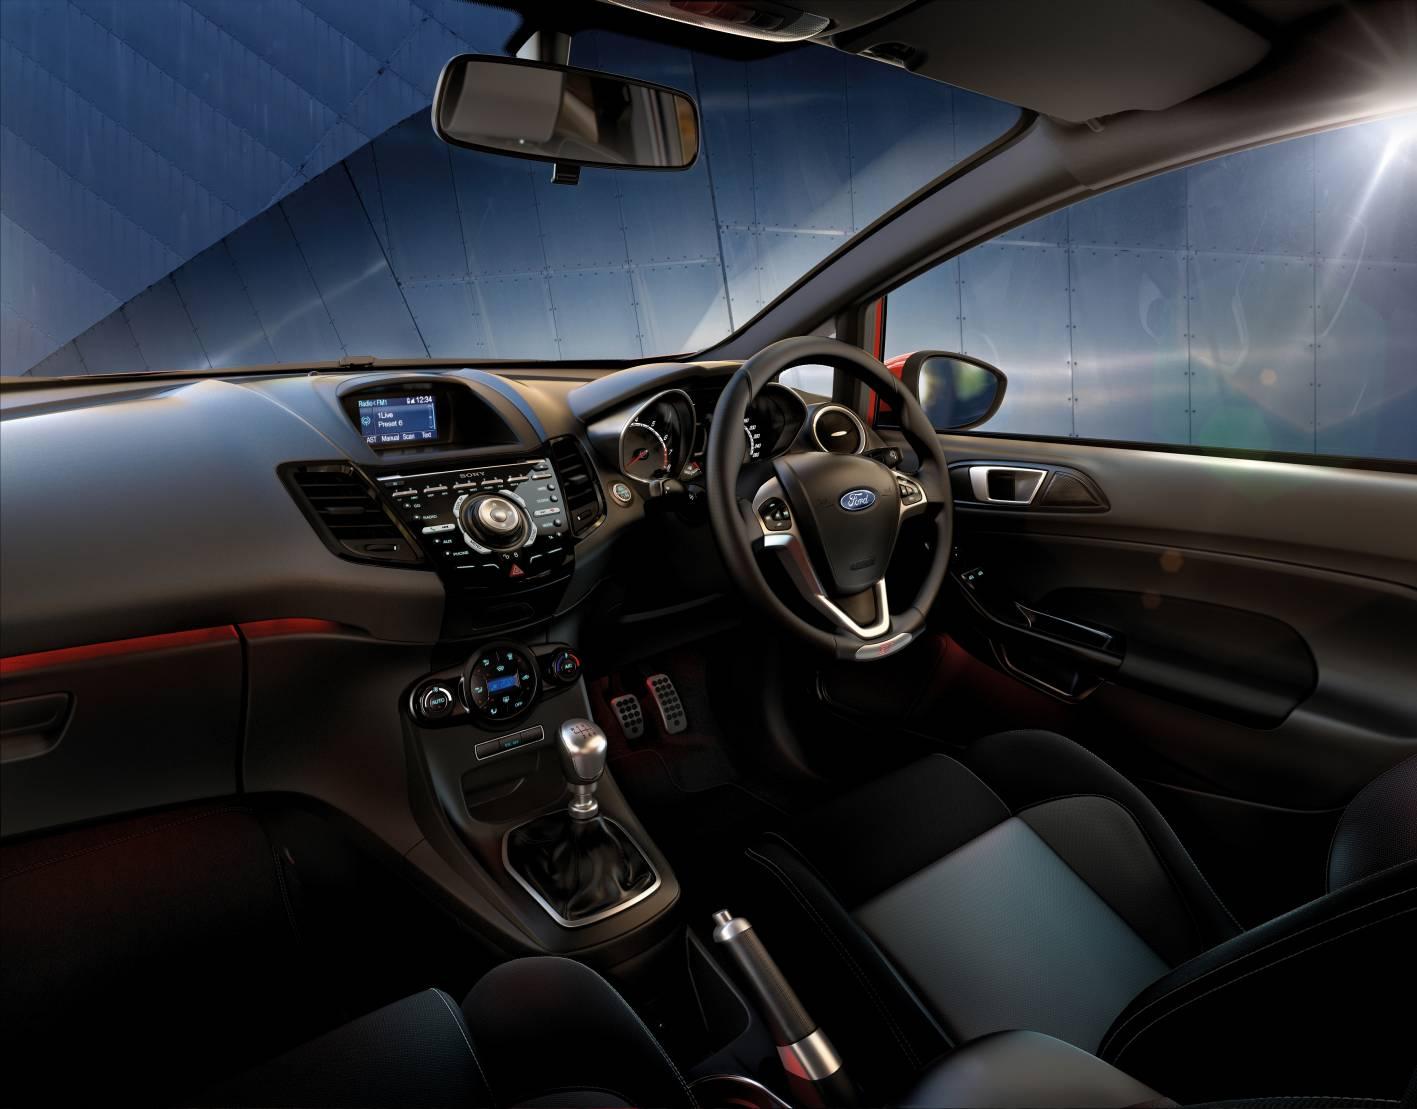 Ford Fiesta Sync Ford Fiesta st 3